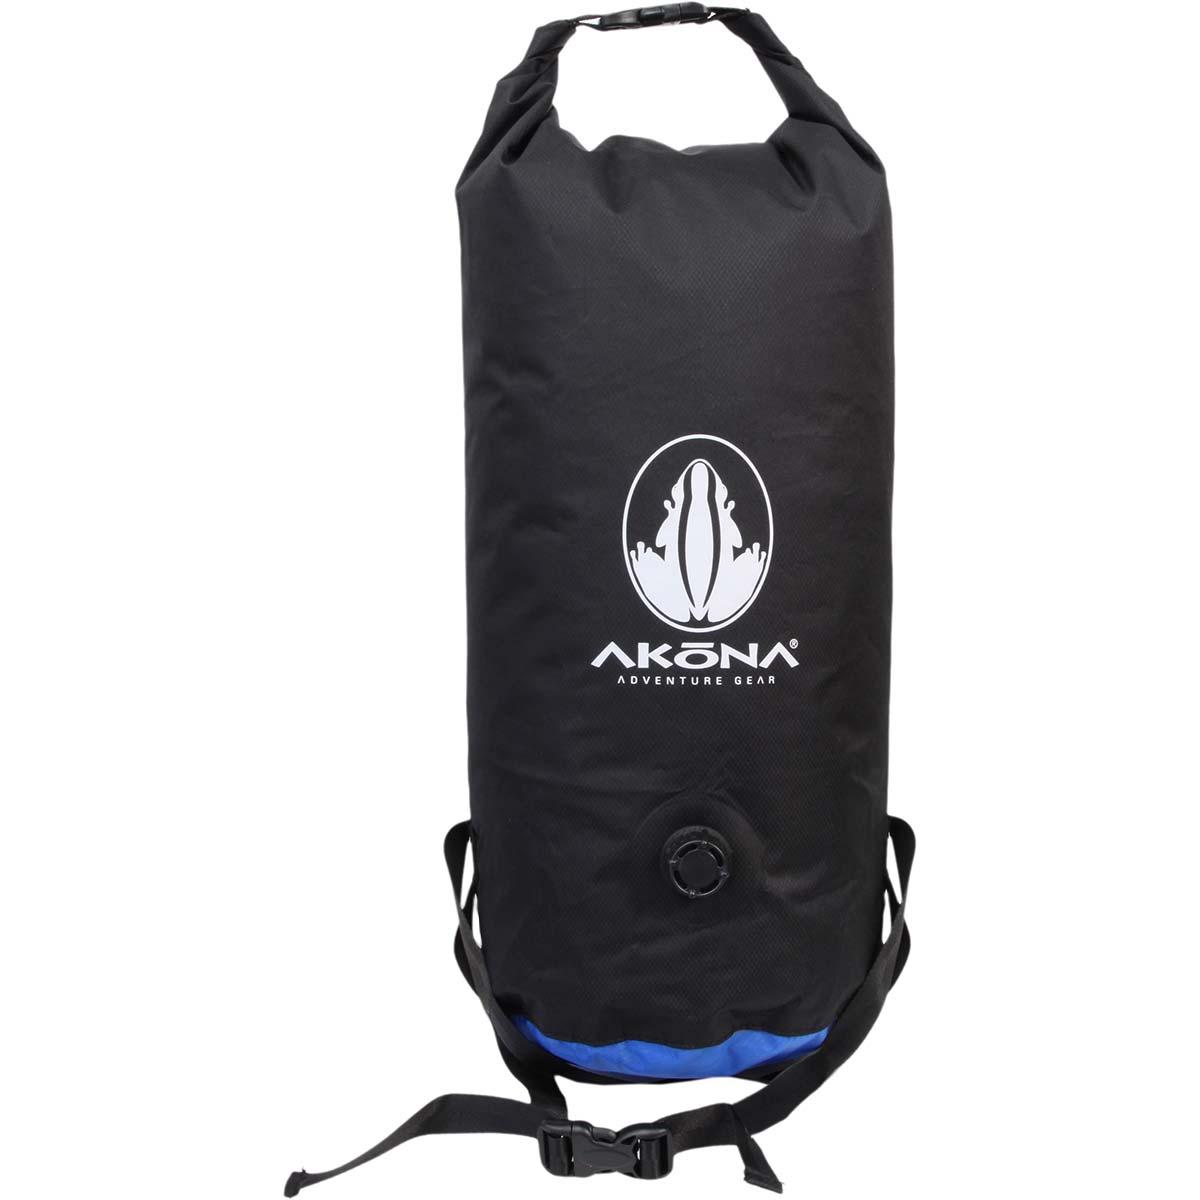 Akona Dry Compression Sack AKB796